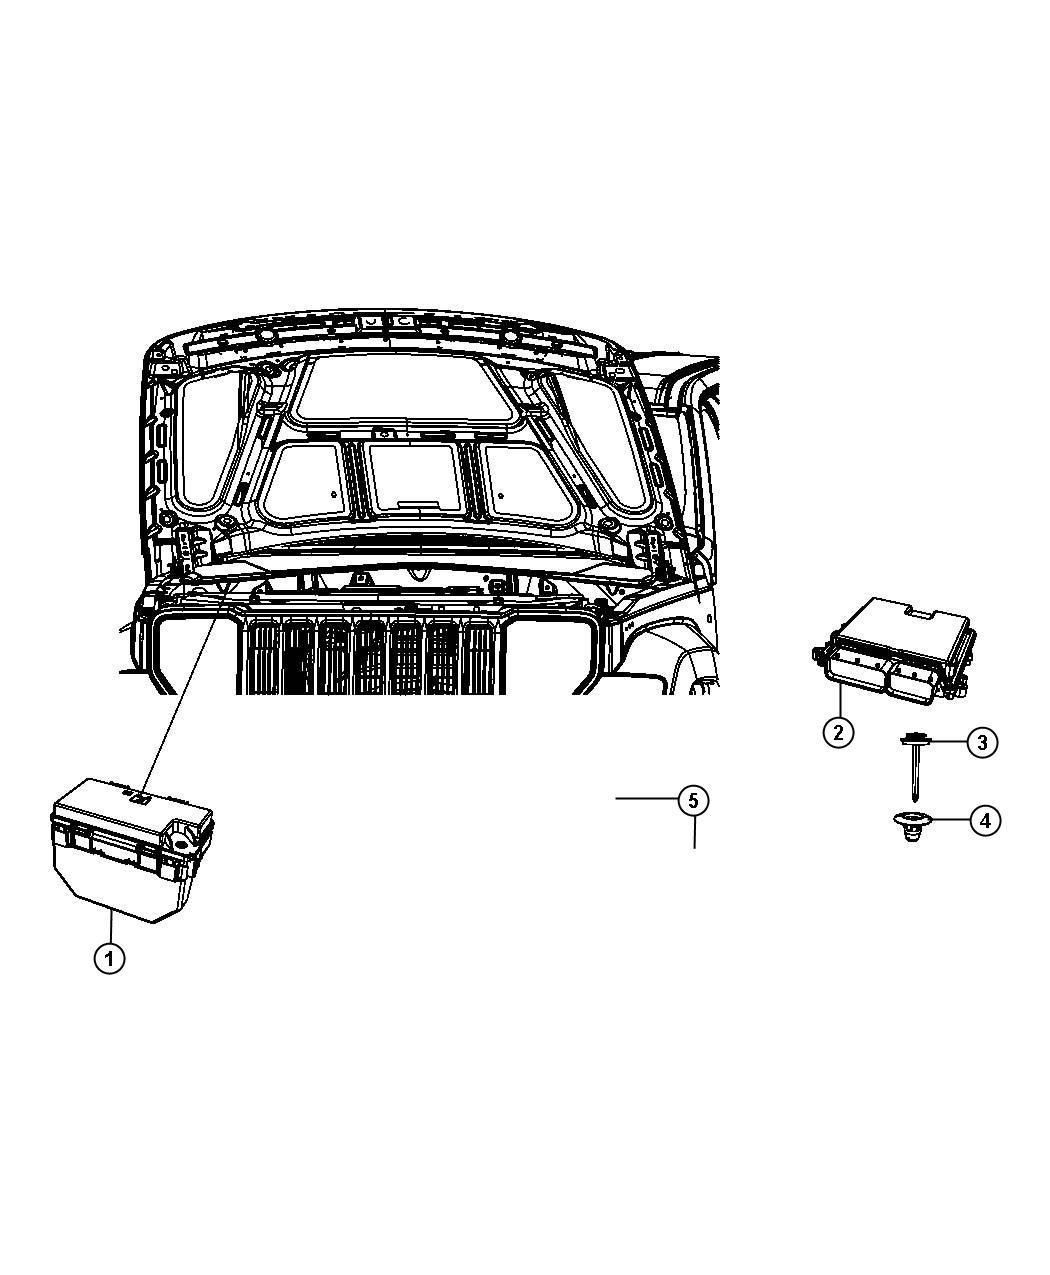 2010 Jeep Wrangler Module. Powertrain control. Generic